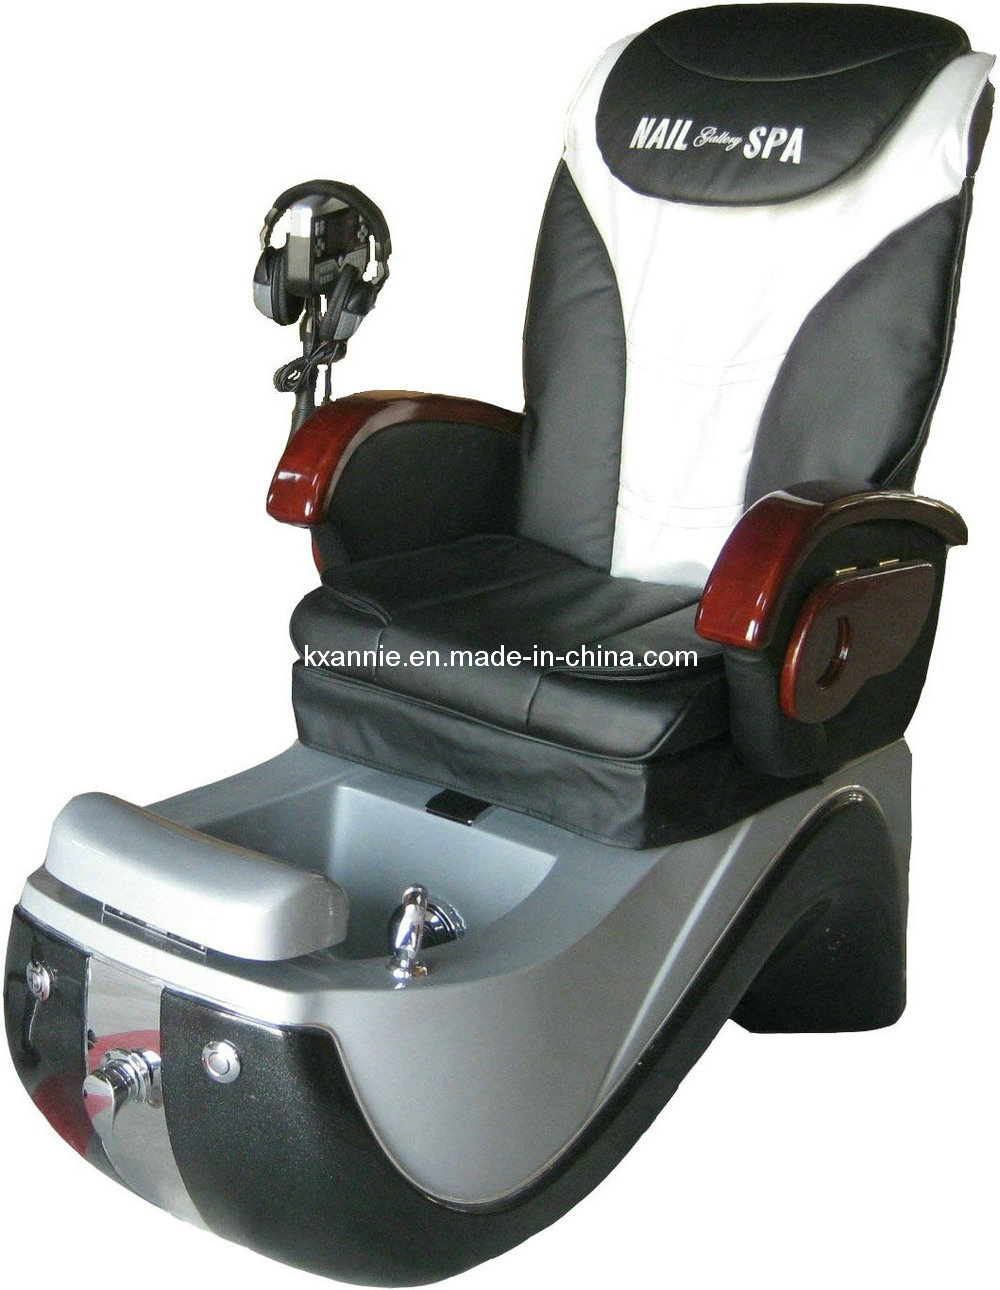 La silla regia de pedicure del masaje del balneario valida for Sillas para pedicure